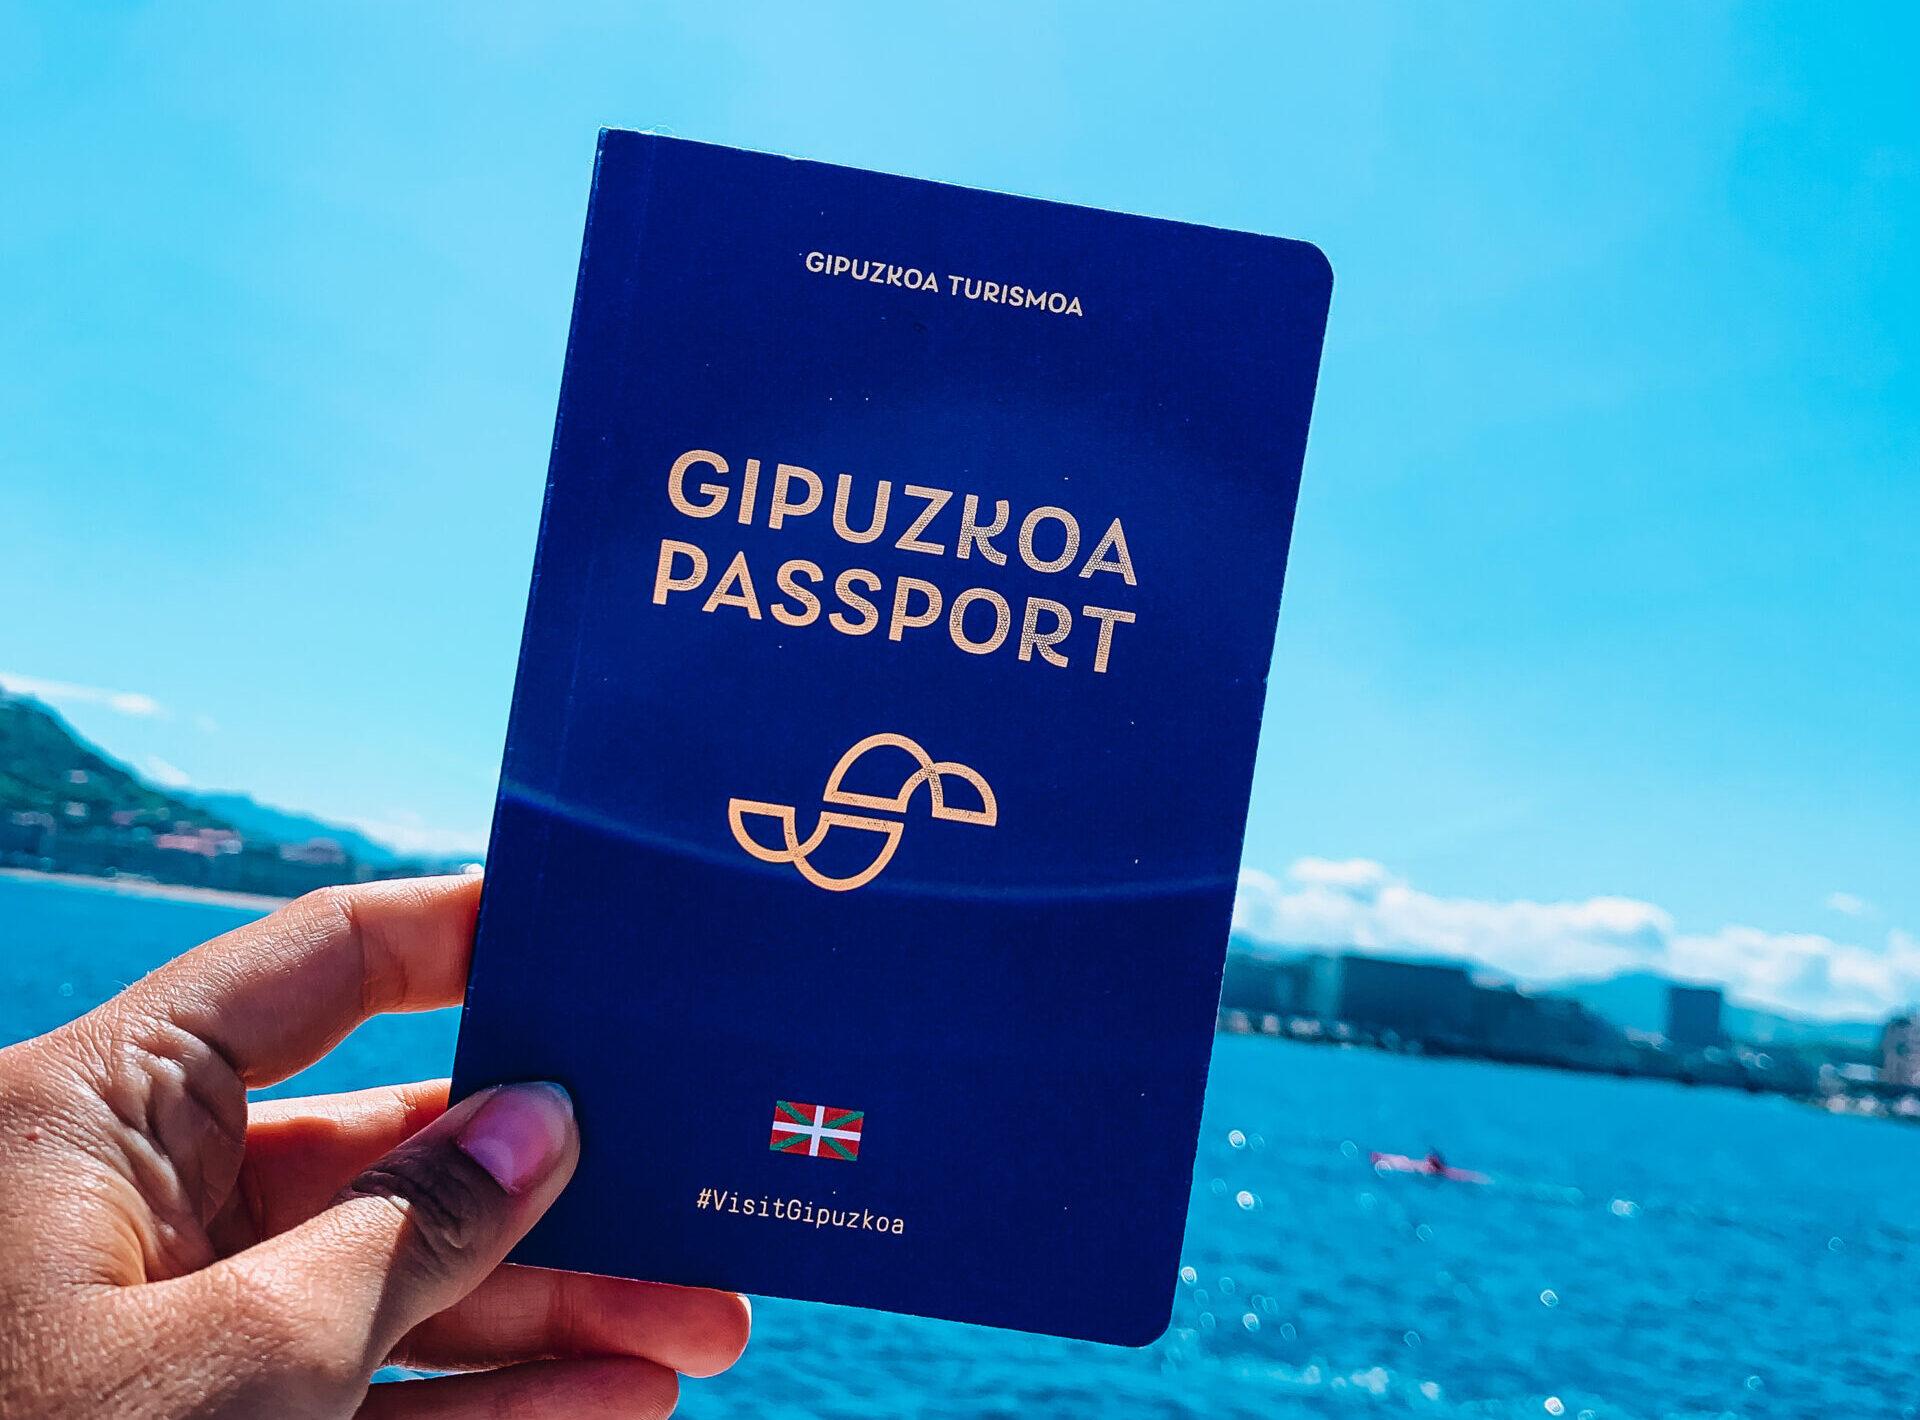 pasaporte gipuzkoa